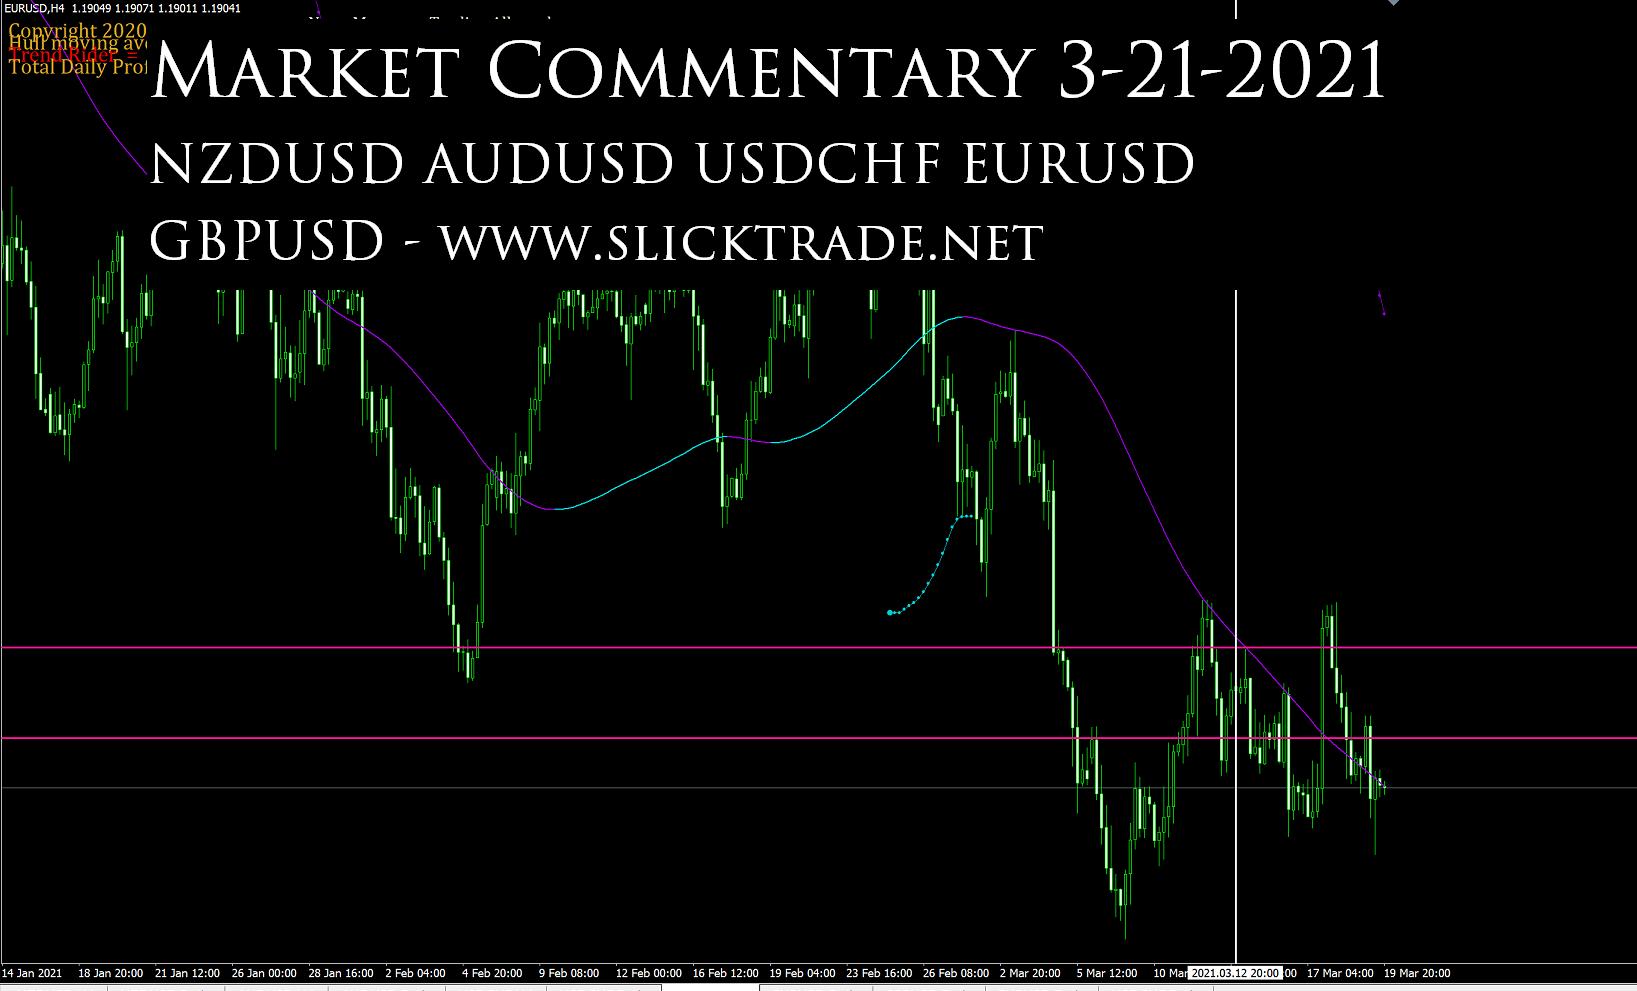 Market Commentary 3-21-2021 - NZDUSD AUDUSD USDCHF EURUSD GBPUSD